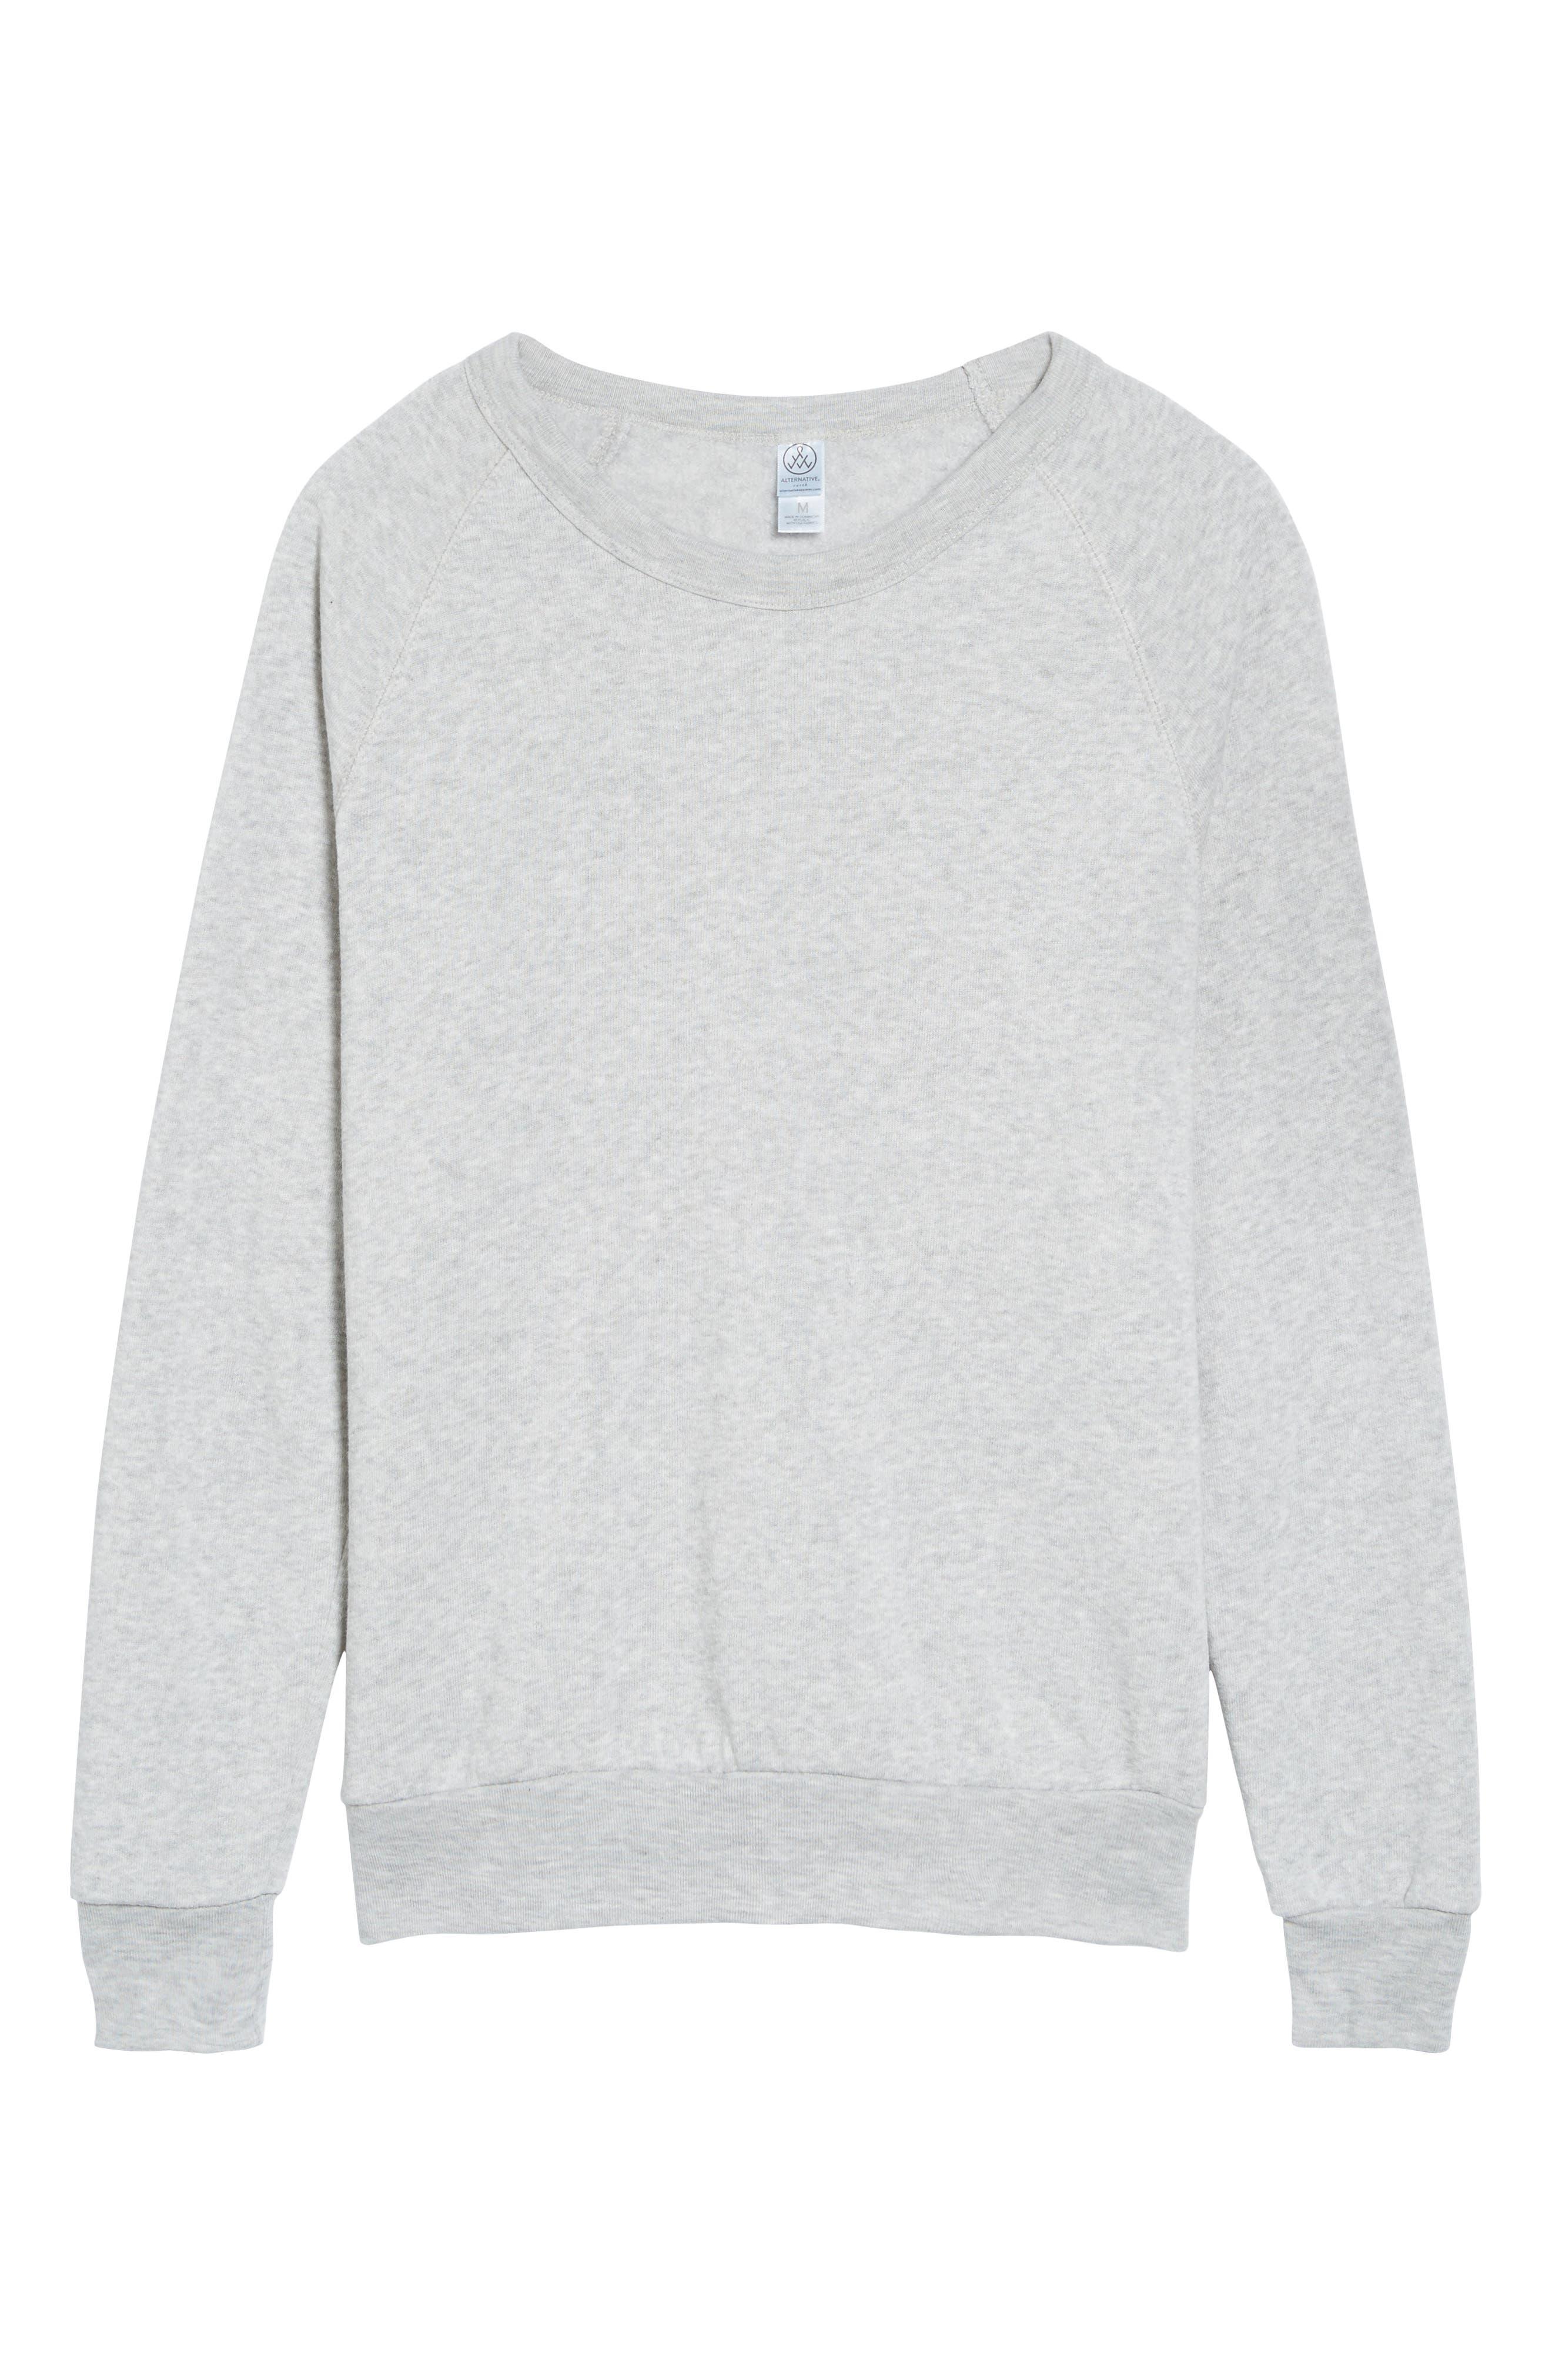 'The Champ' Sweatshirt,                             Alternate thumbnail 69, color,